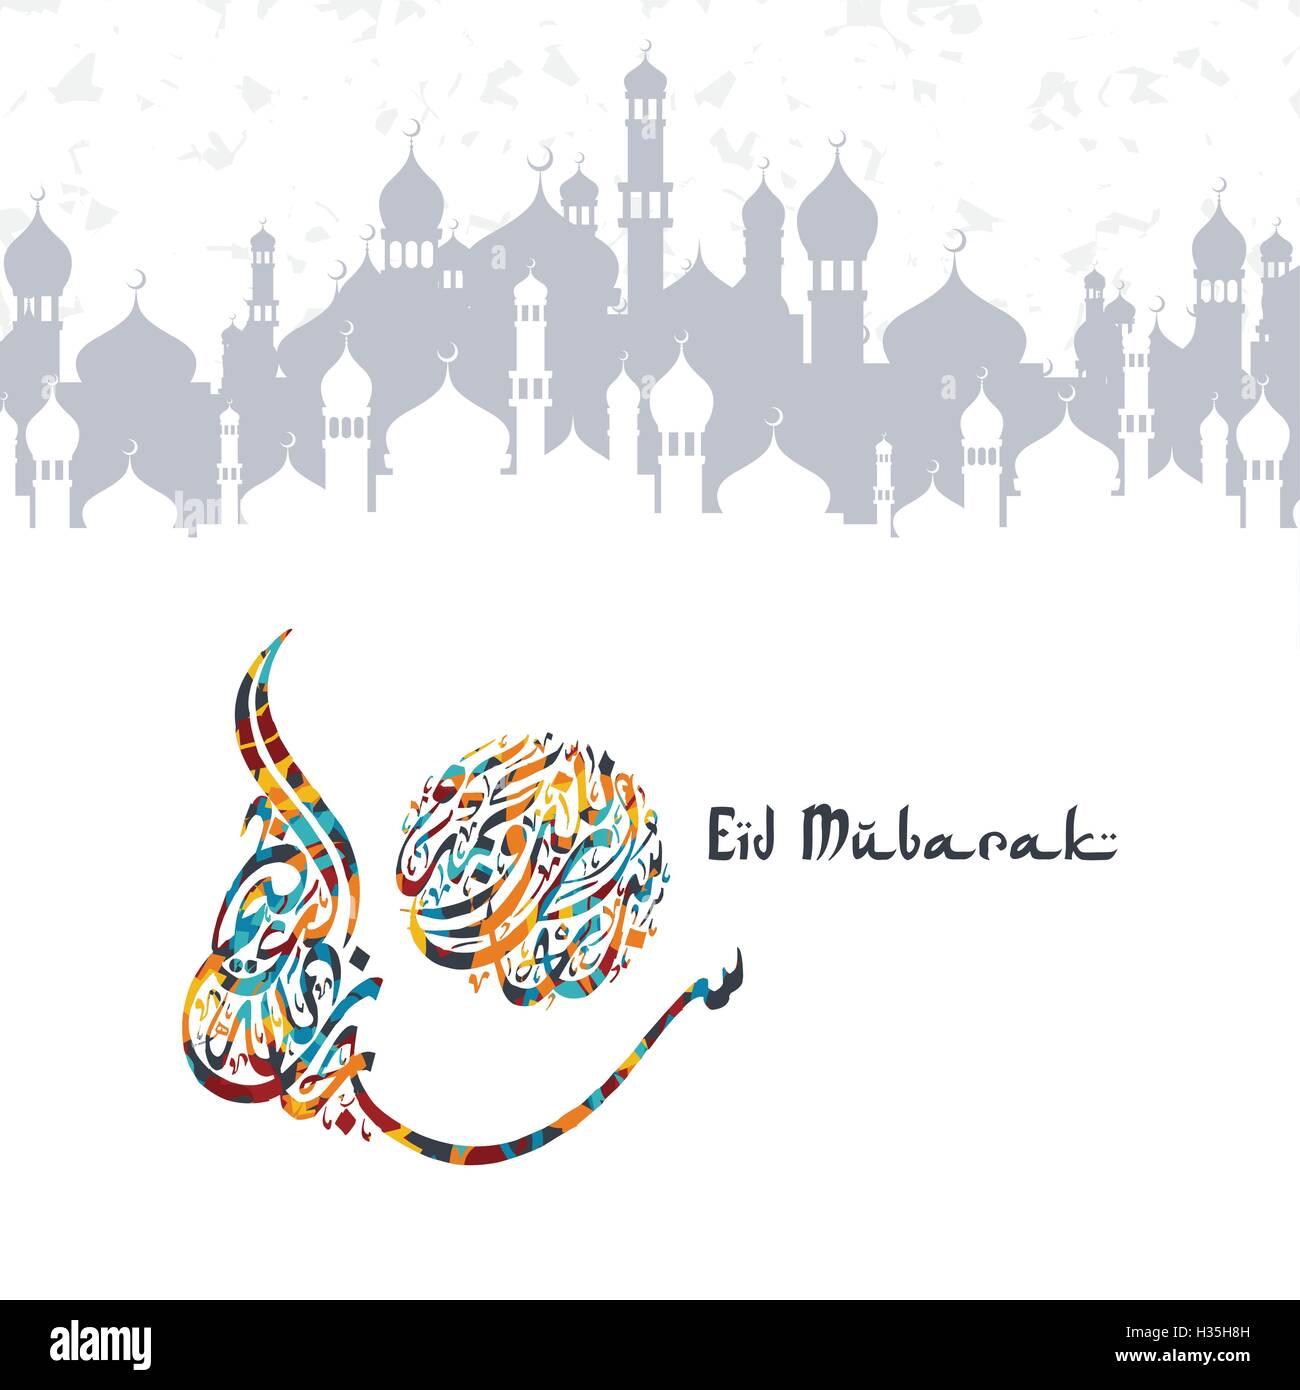 Happy Eid Mubarak Greetings Arabic Calligraphy Art Stock Vector Image Art Alamy